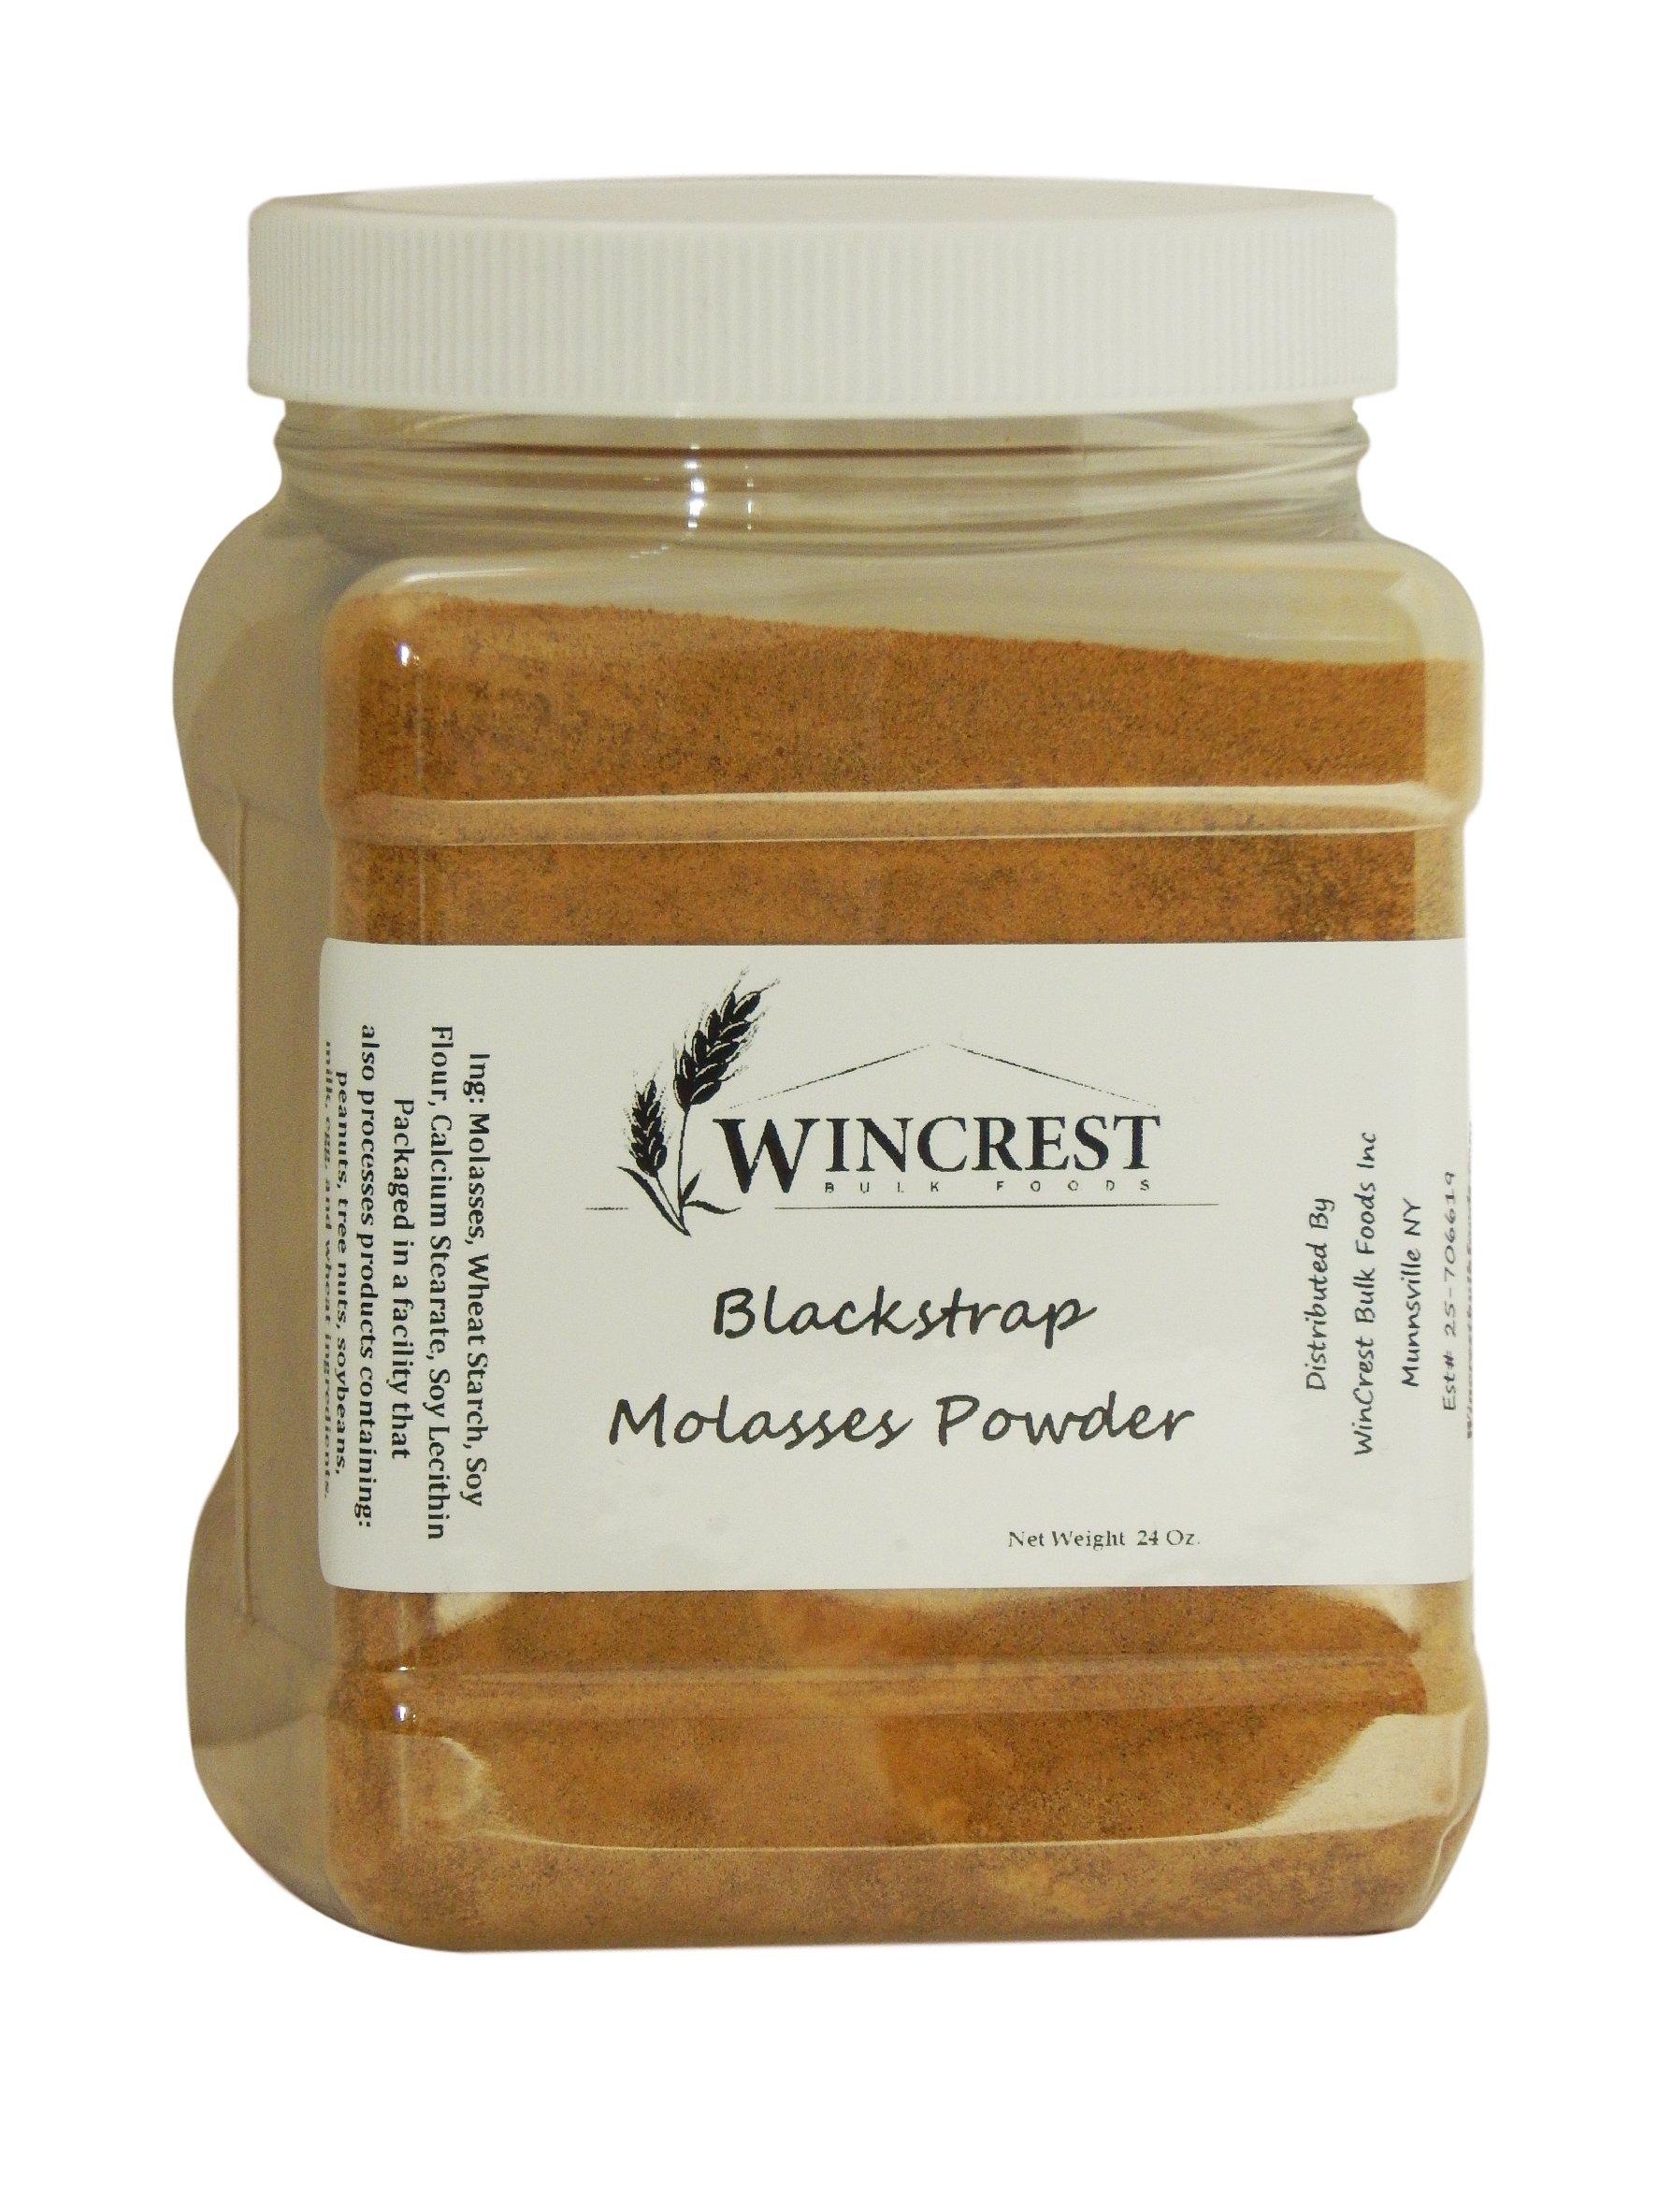 Blackstrap Molasses Powder - 1.5 Lb Container